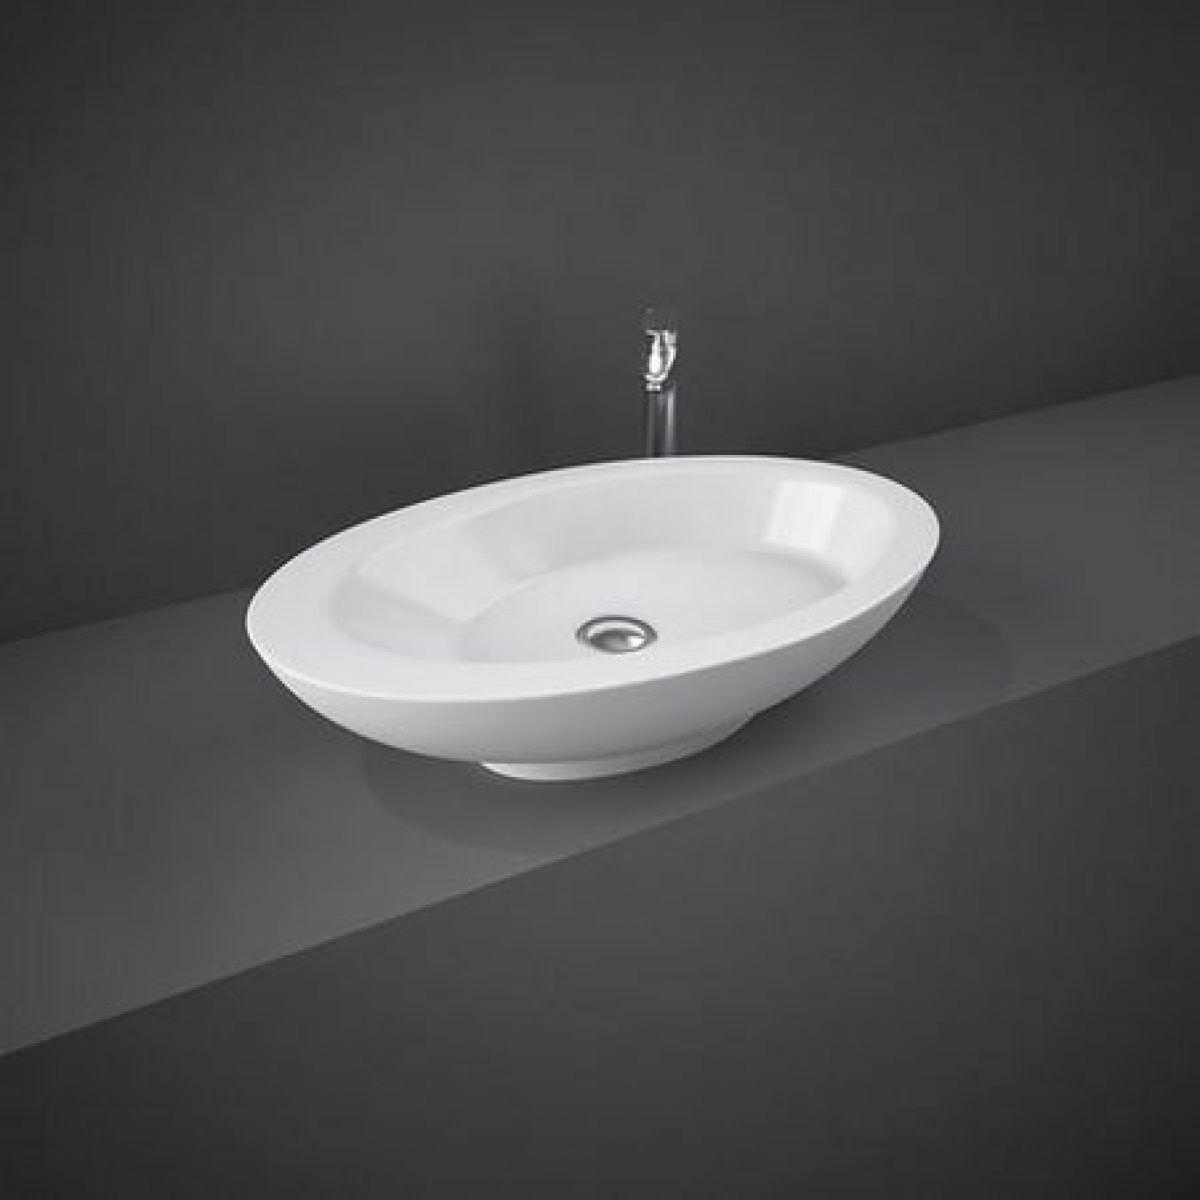 rak infinity countertop basin